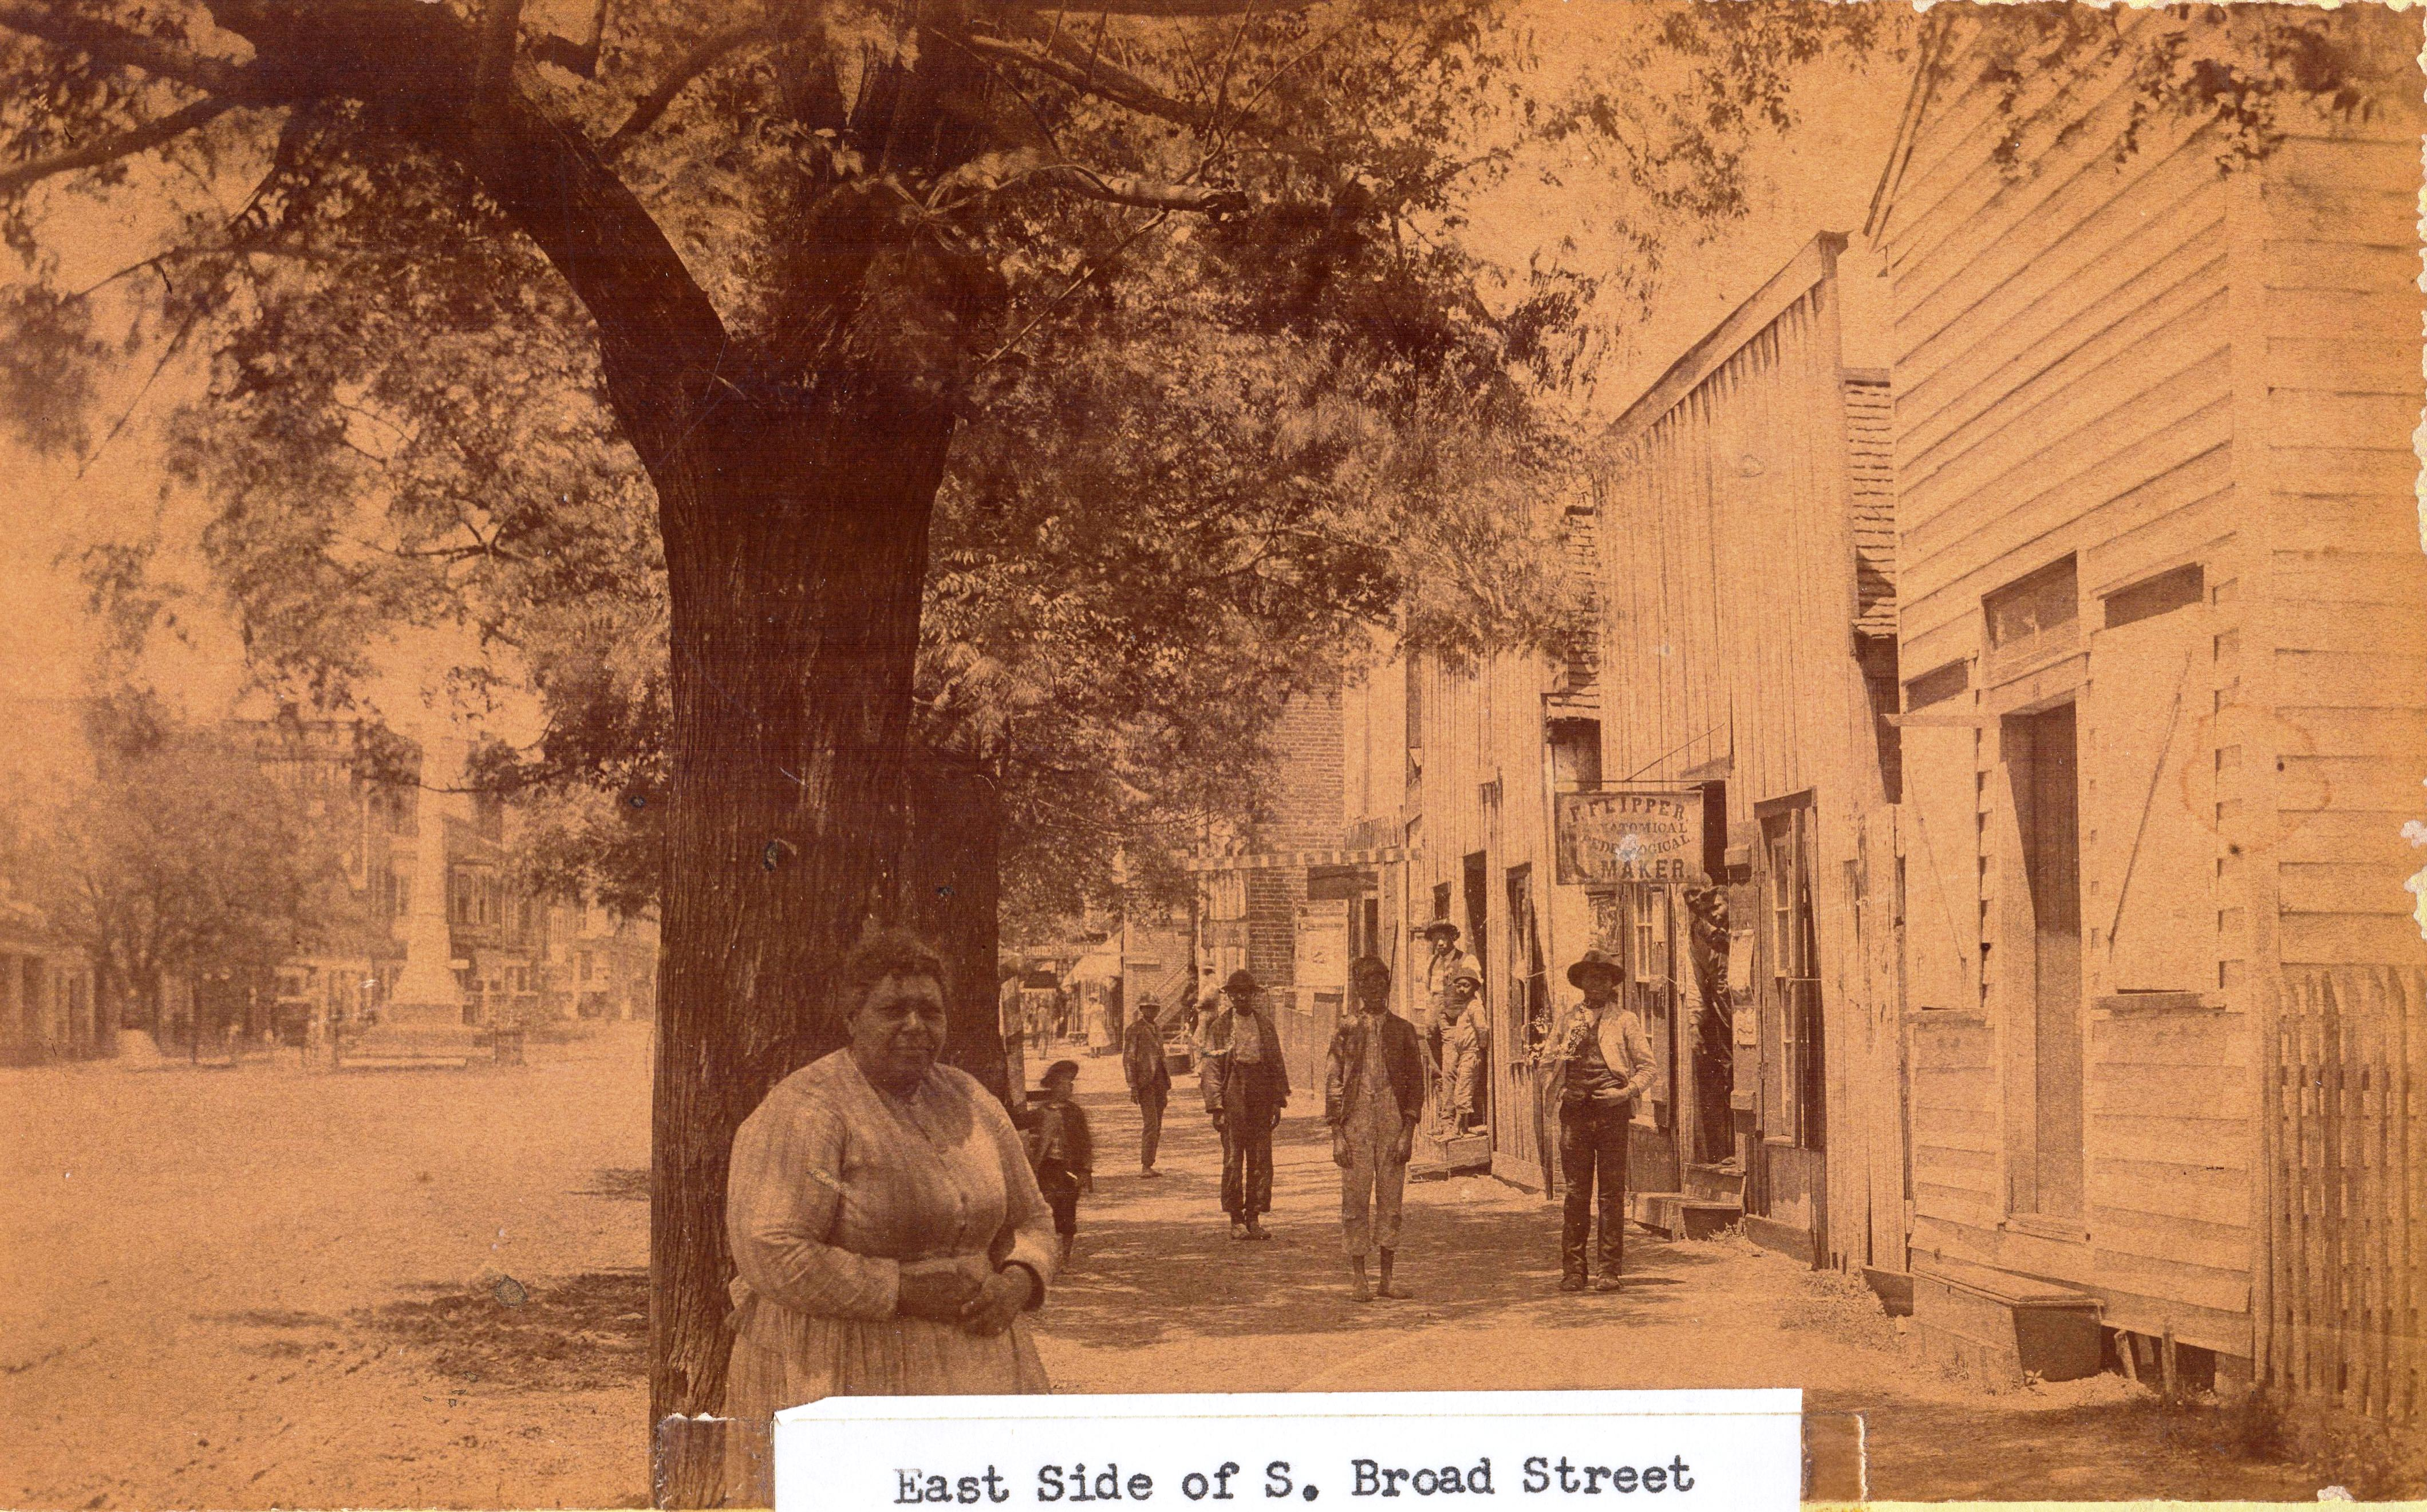 200 Block of S. Broad Street, c.1895